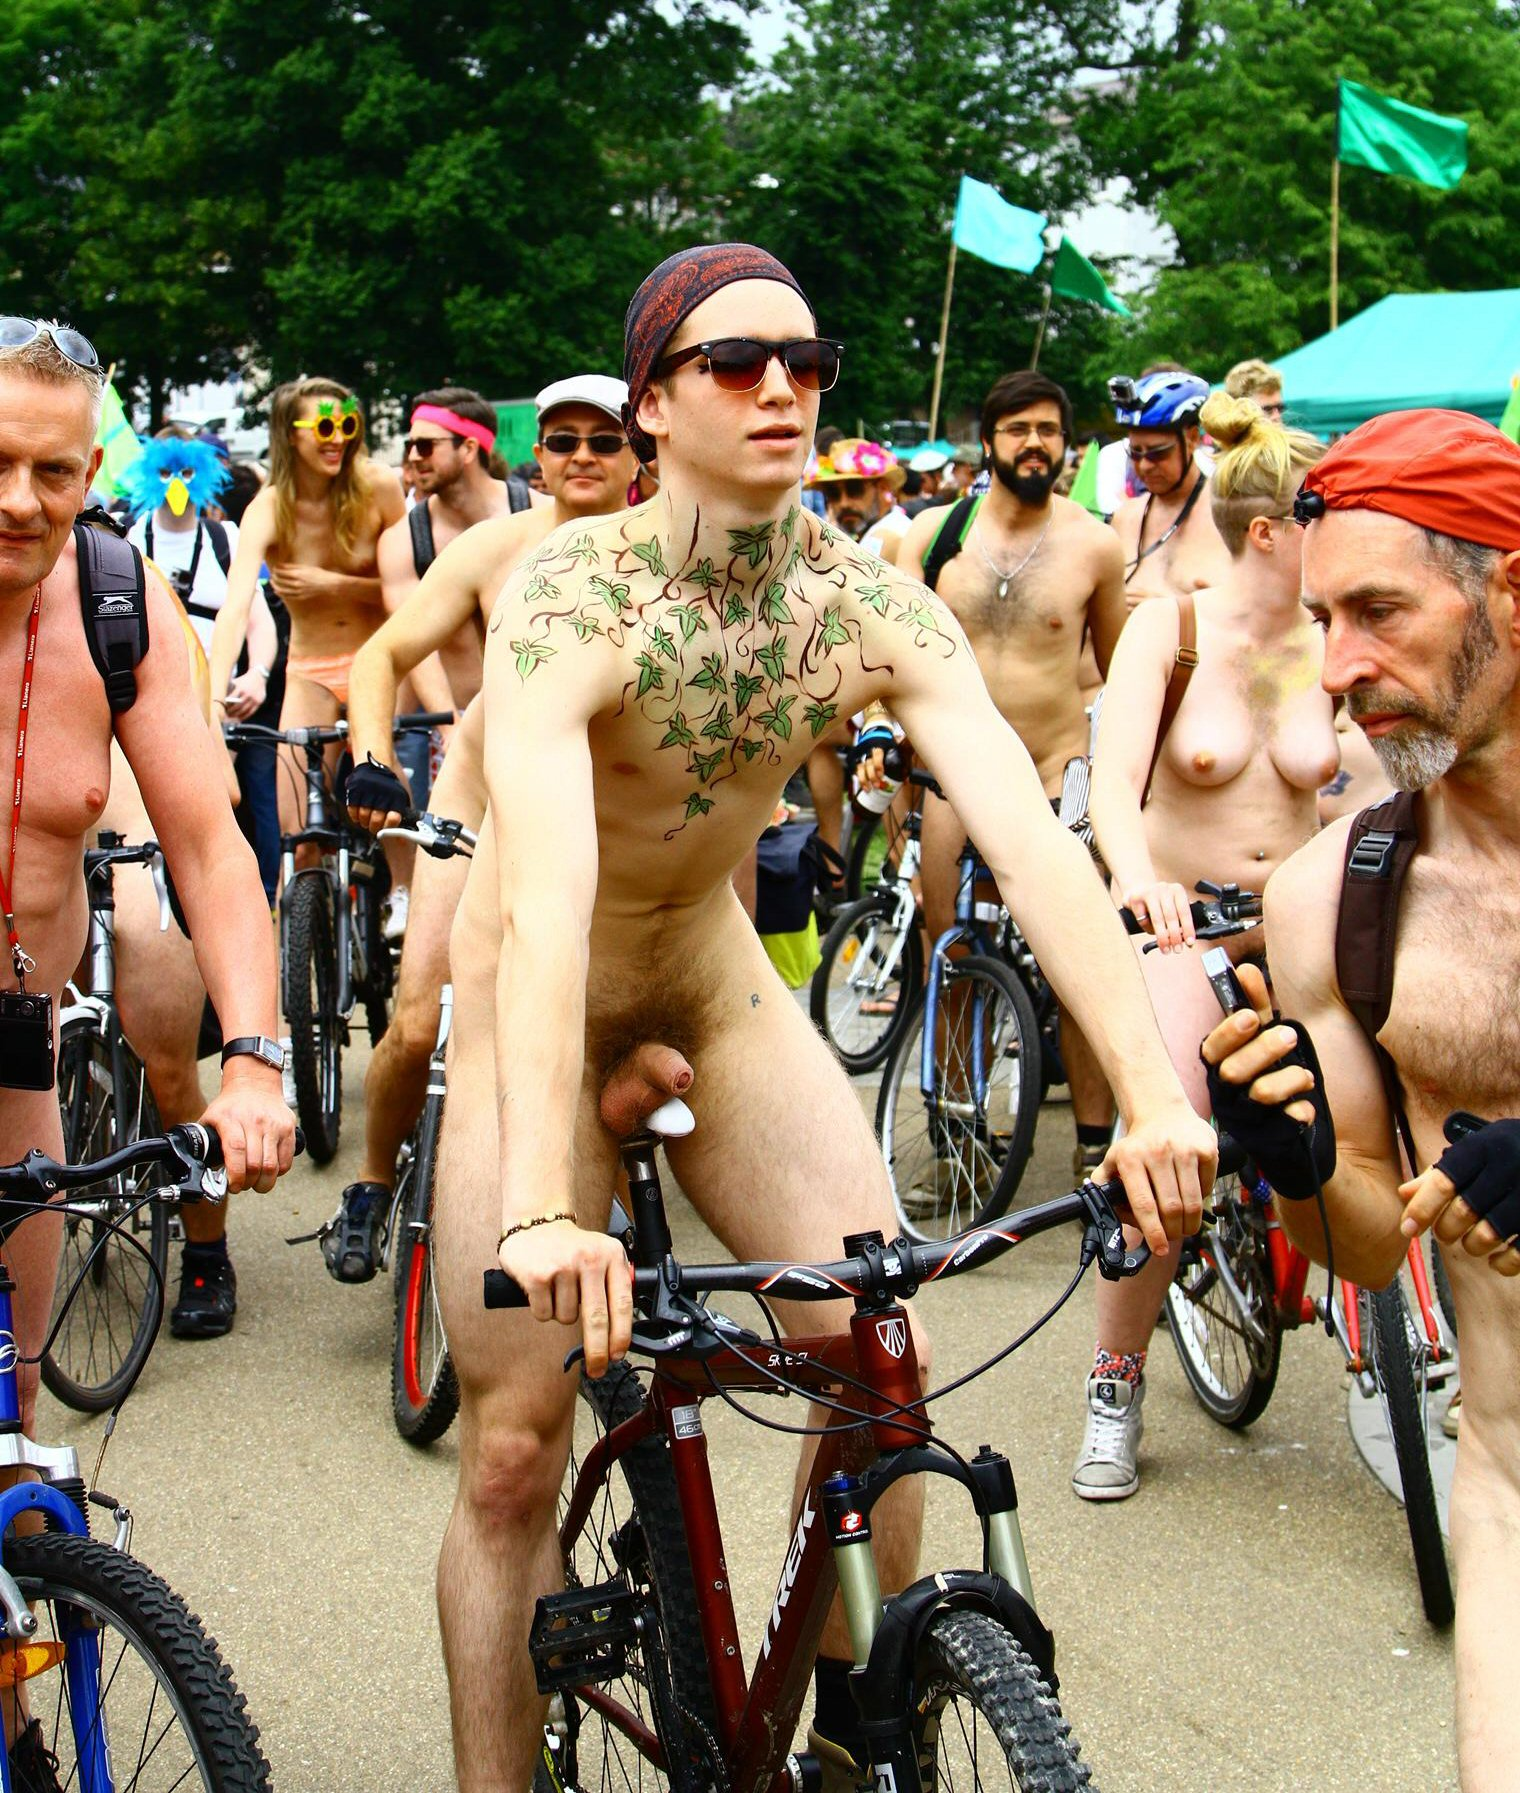 Nude family sex taboo